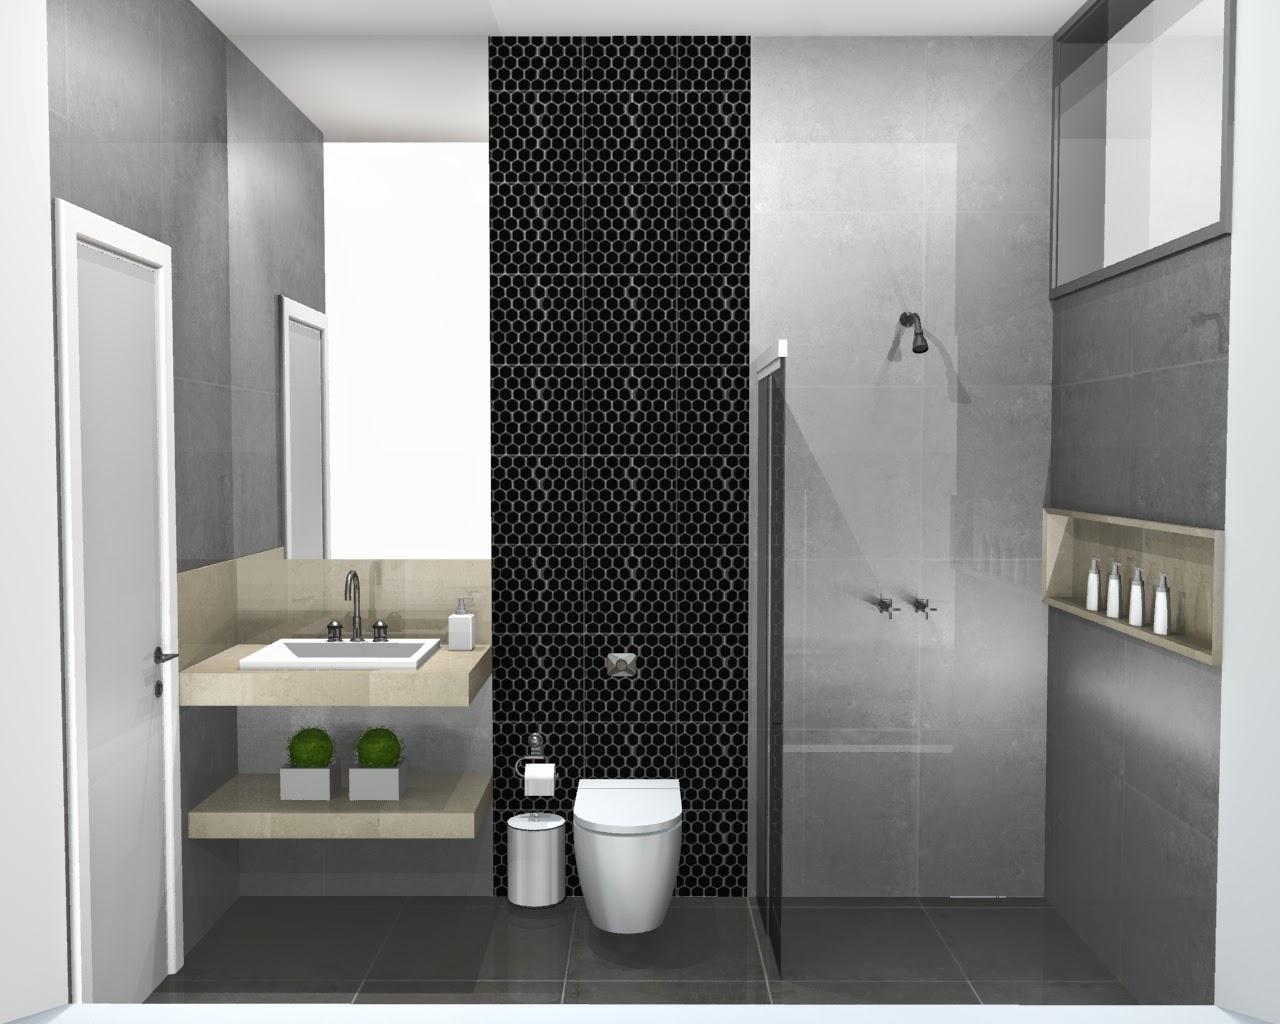 Imagens de #766D55 piso) Porcelanato natural (acetinado) de cor cinza claro tamanho  1280x1024 px 3702 Banheiros Porcelanato Bege